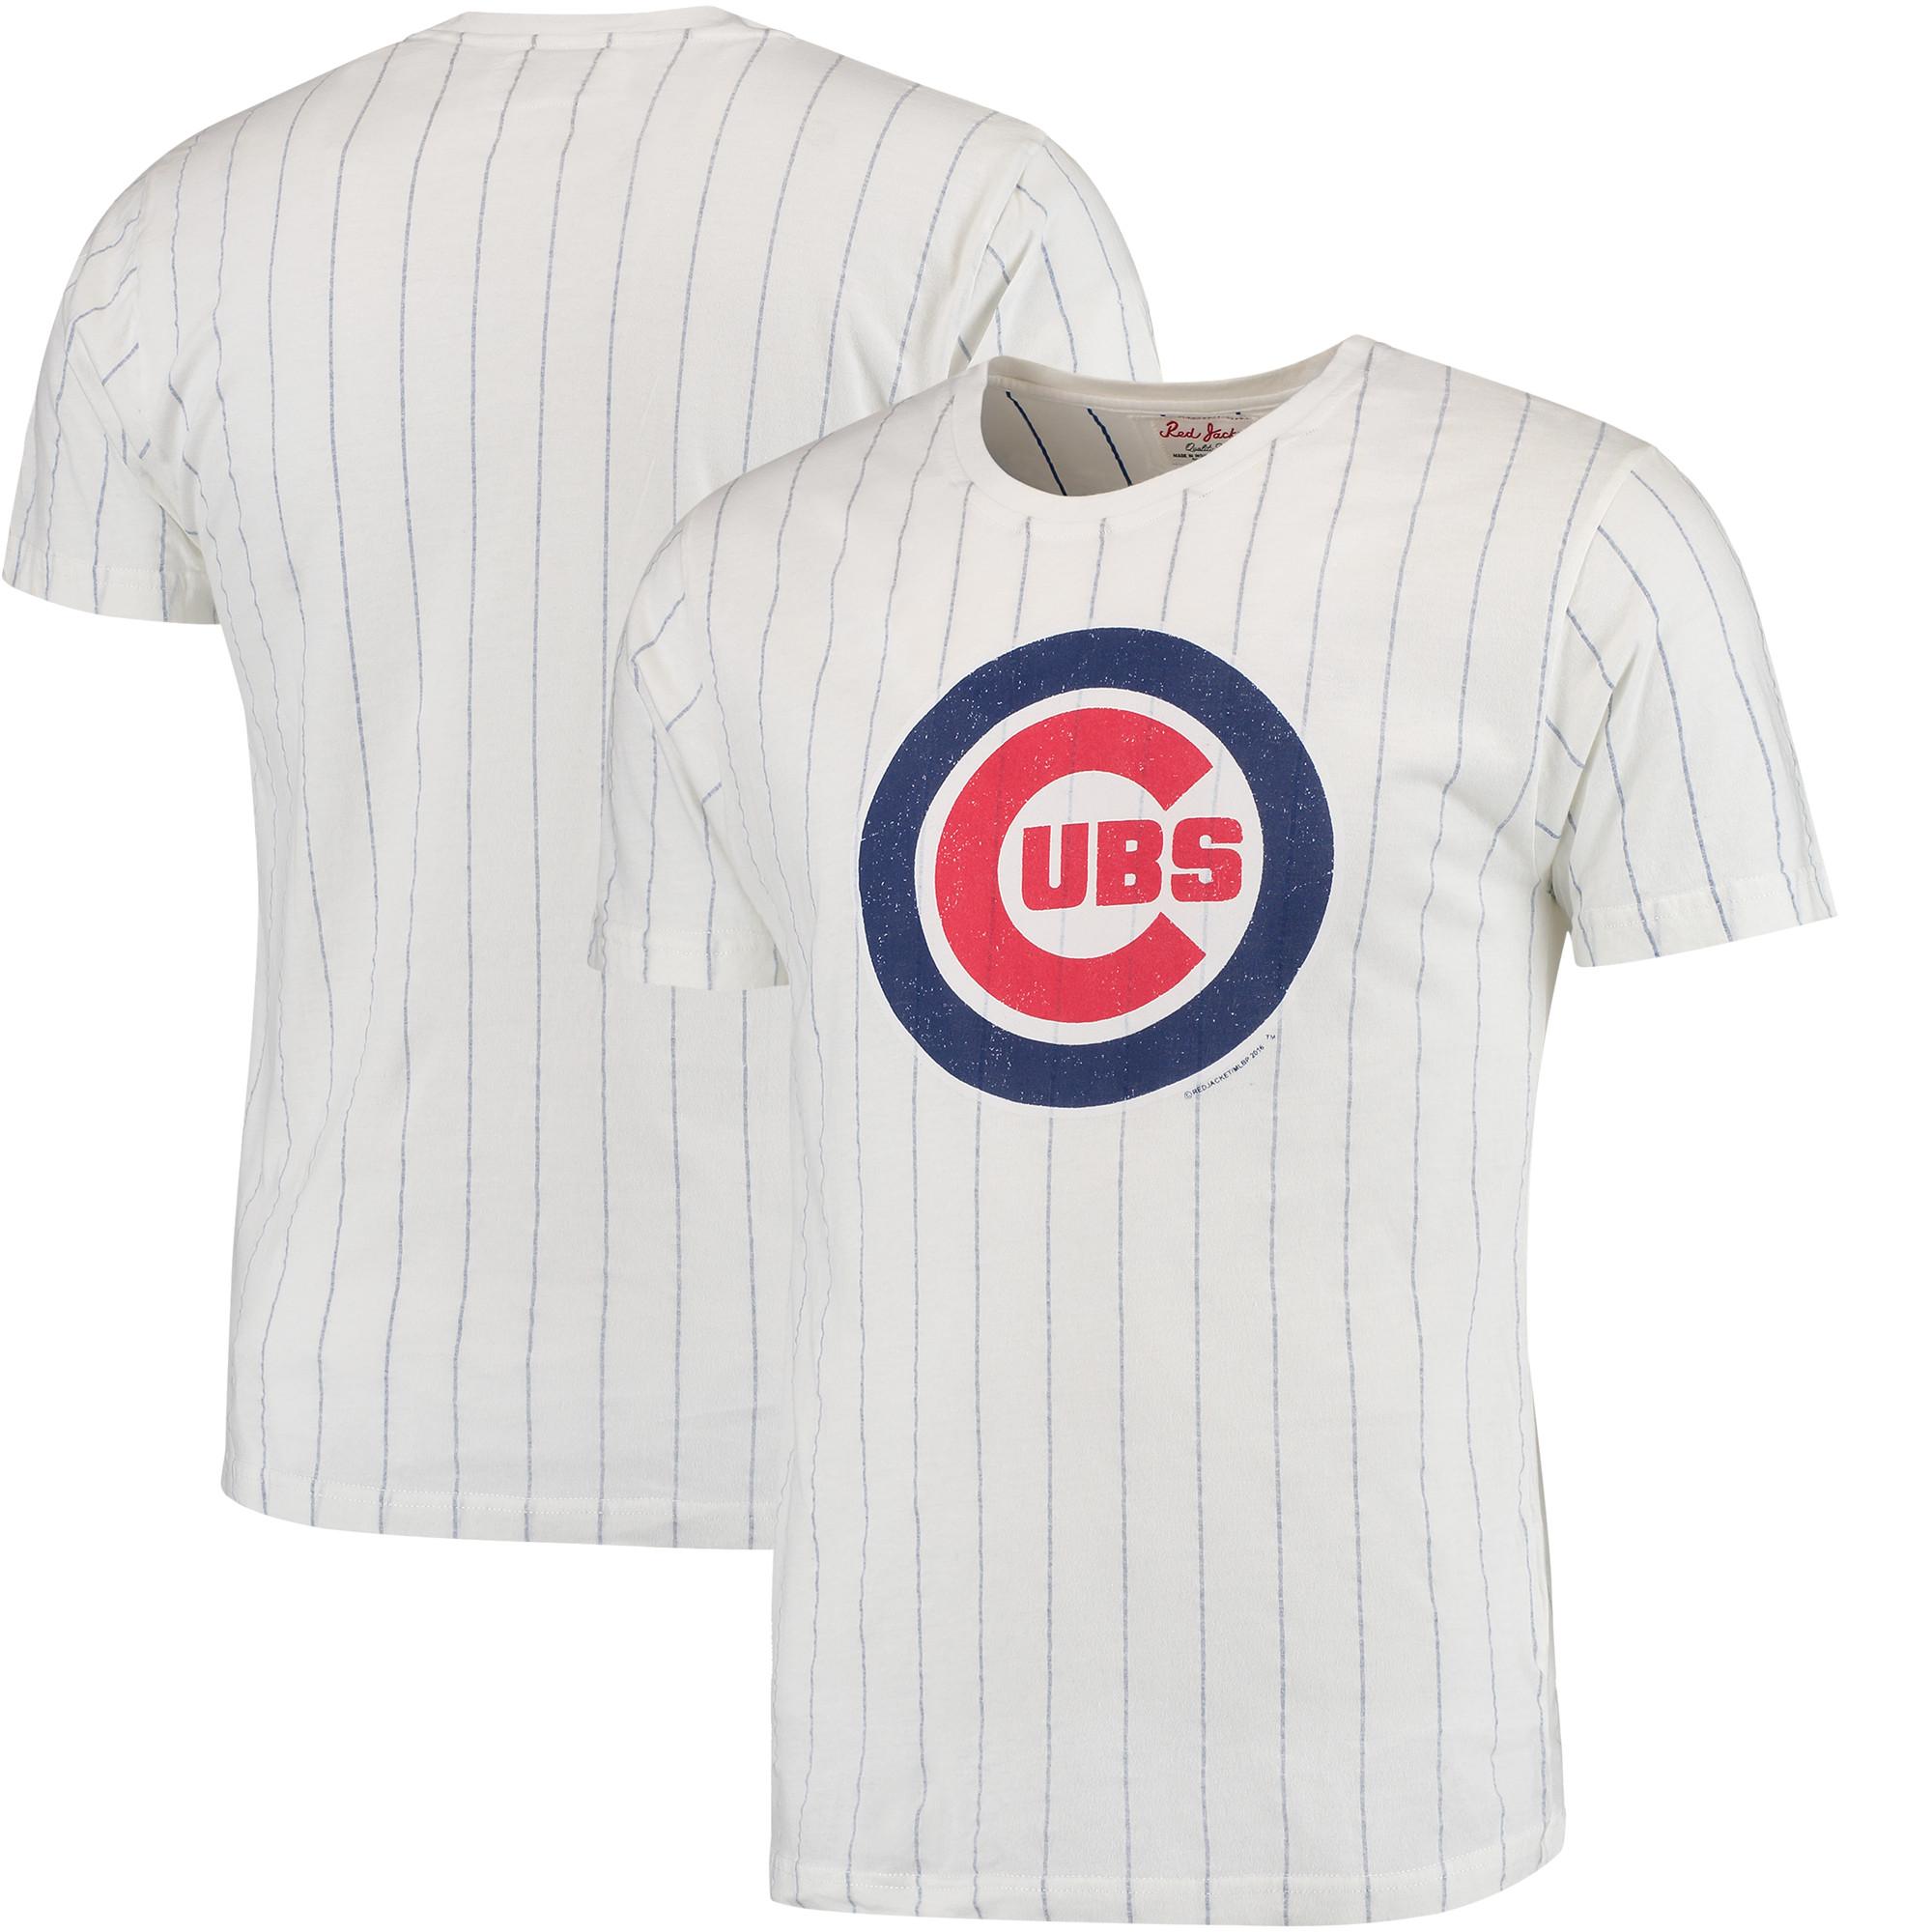 Chicago Cubs Red Jacket Brass Tacks Pinstripe T-Shirt - White